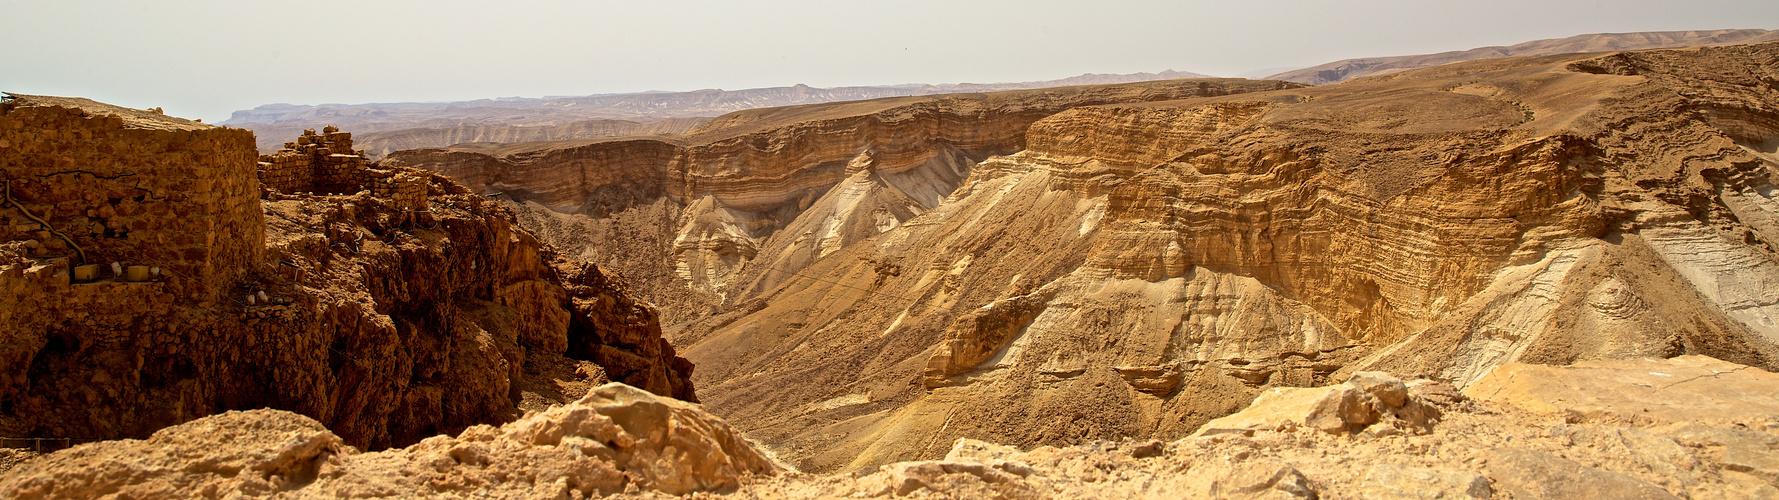 Wadi Masada #2